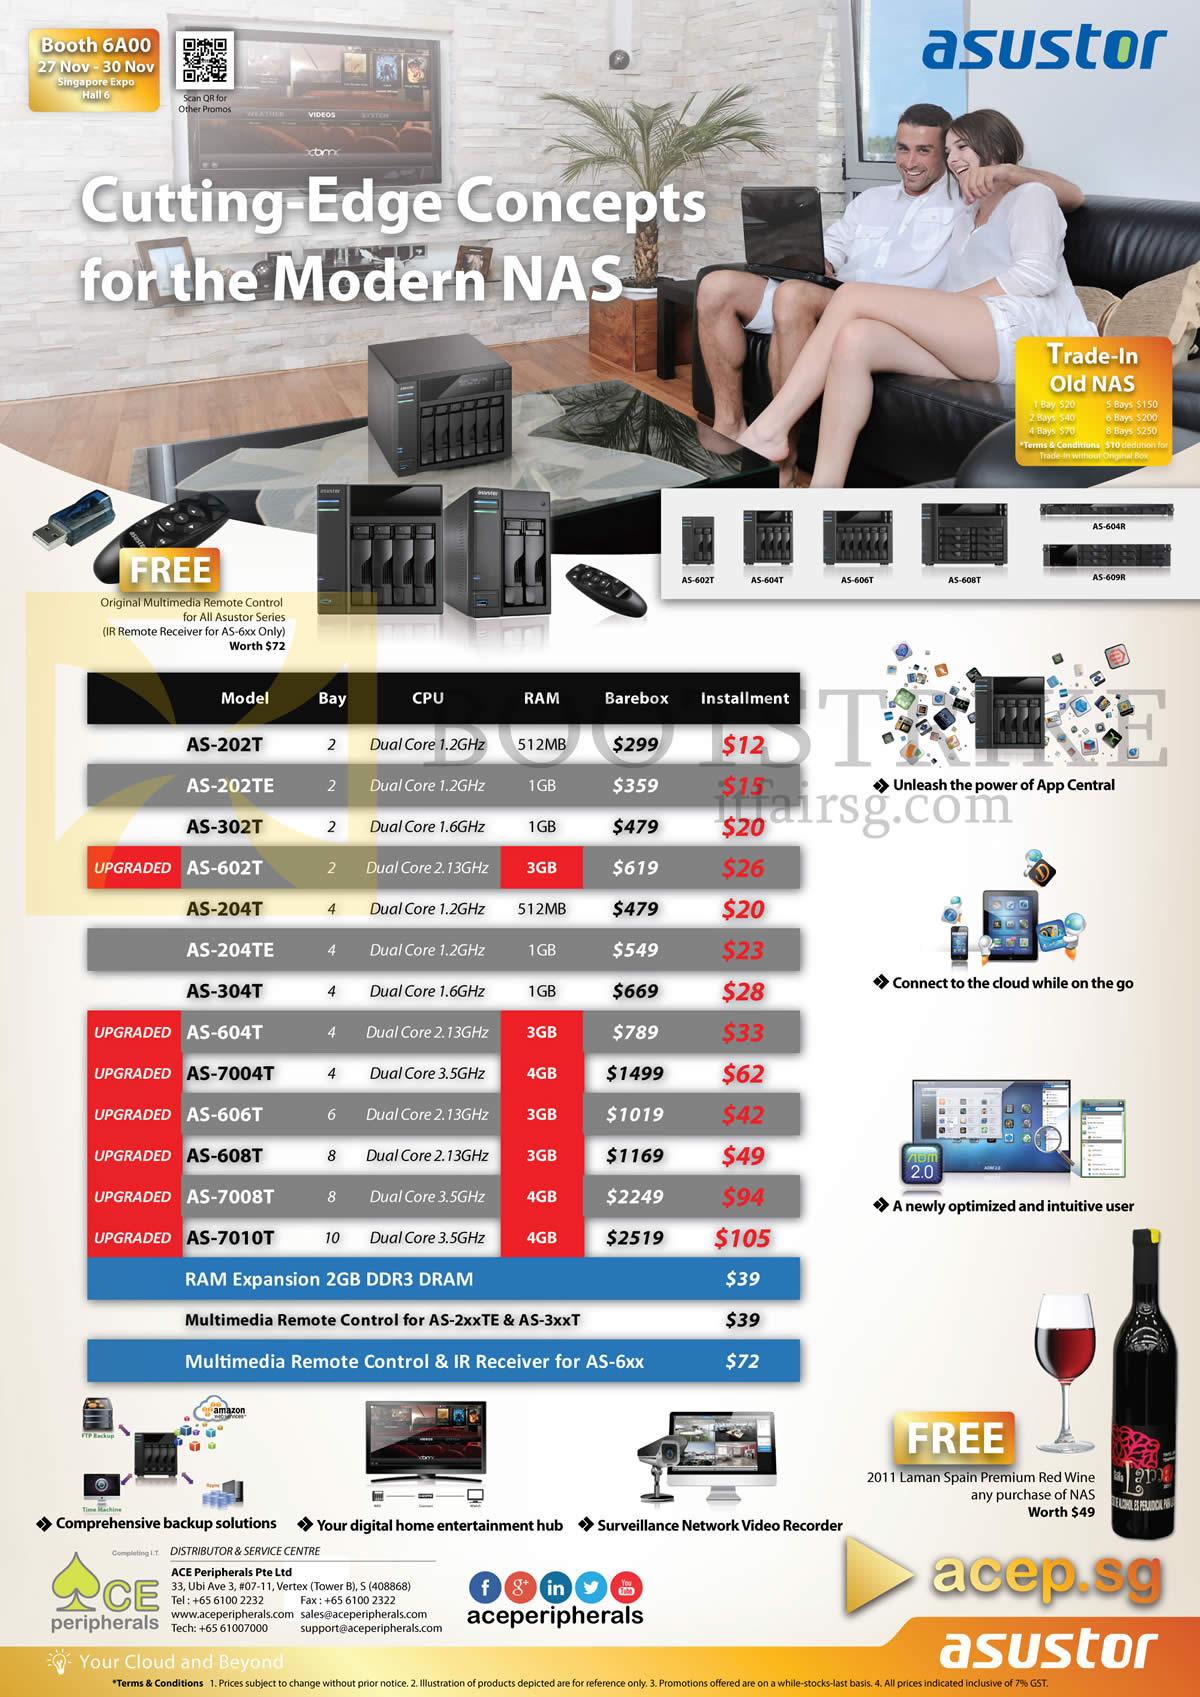 SITEX 2014 price list image brochure of Ace Peripherals Asustor AS N202T, 202TE, 204T, 204TE, 302T, 304T, 602T, 604T, 606T, 608T, 7004T, 7008T, 7010T